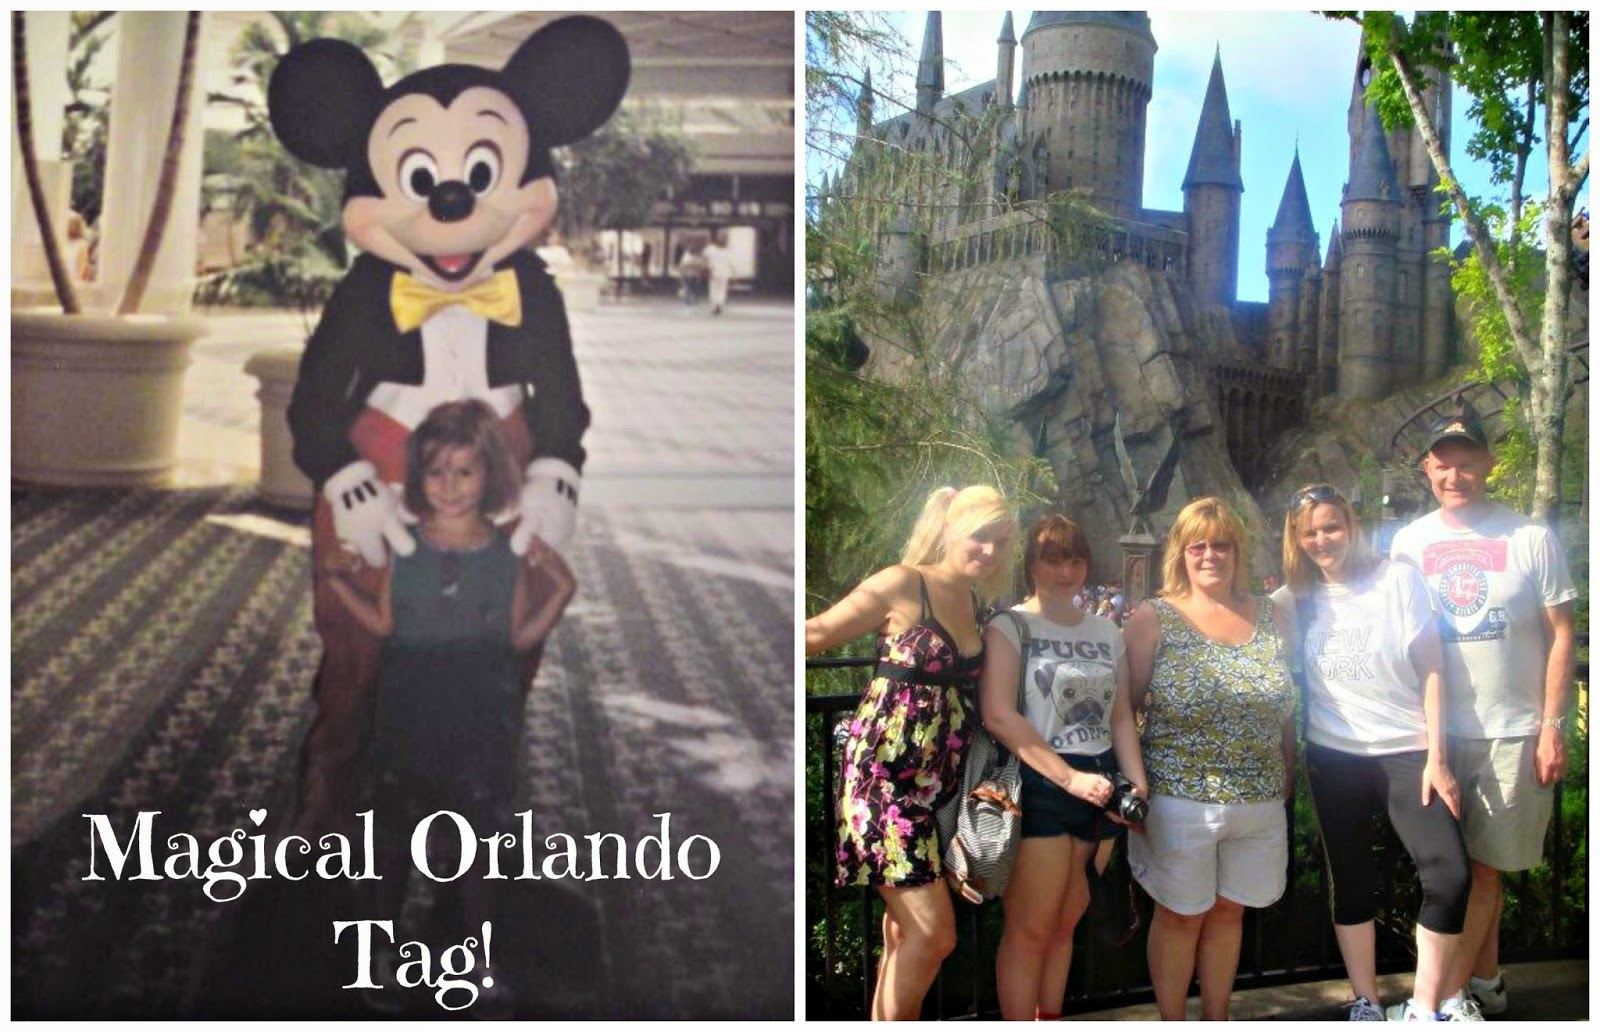 Magical Orlando Tag